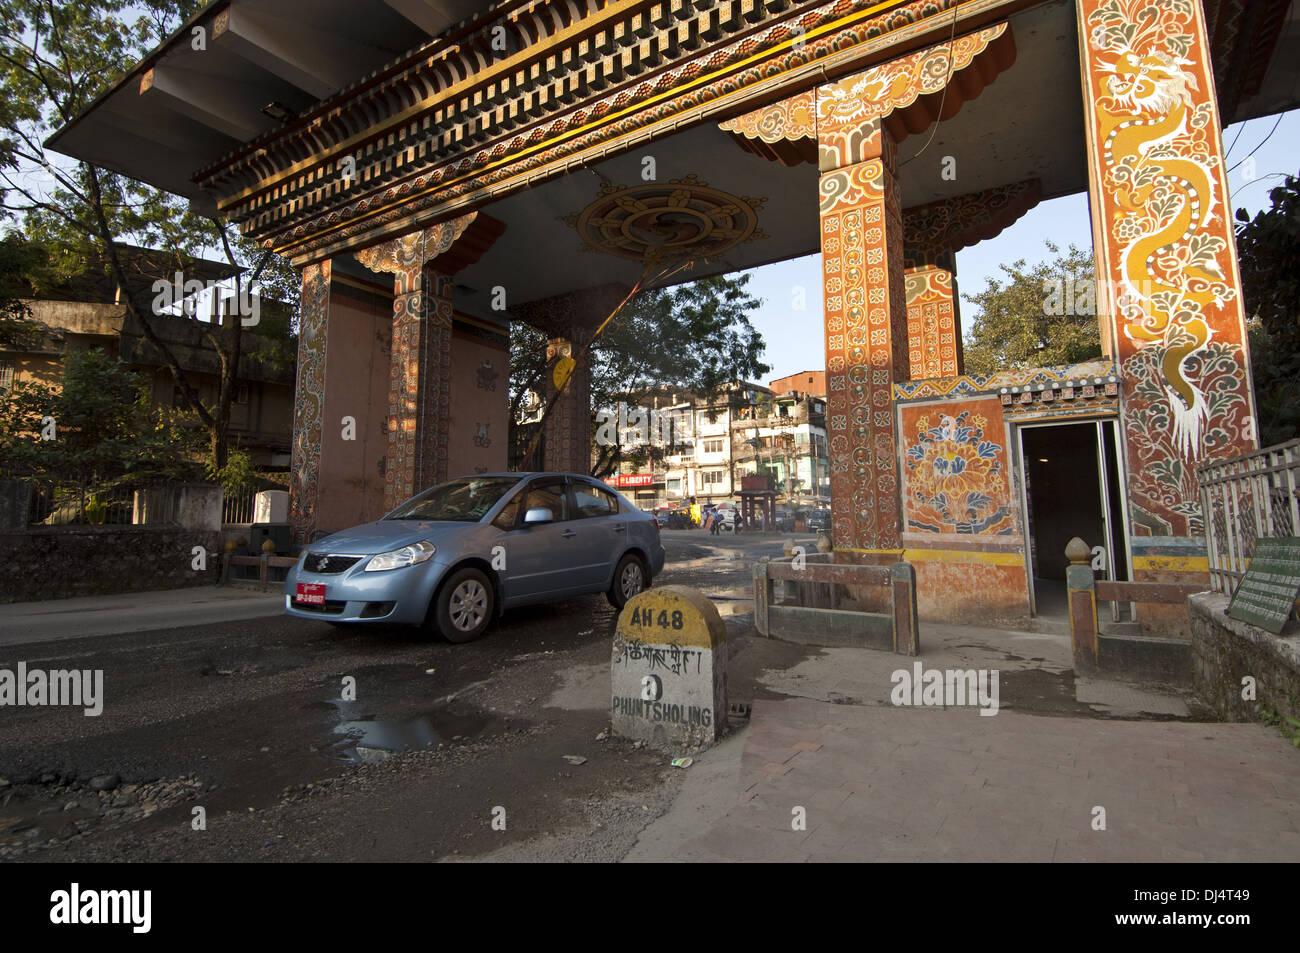 At the Gate of Bhutan, Phuentsholing, Bhutan - Stock Image